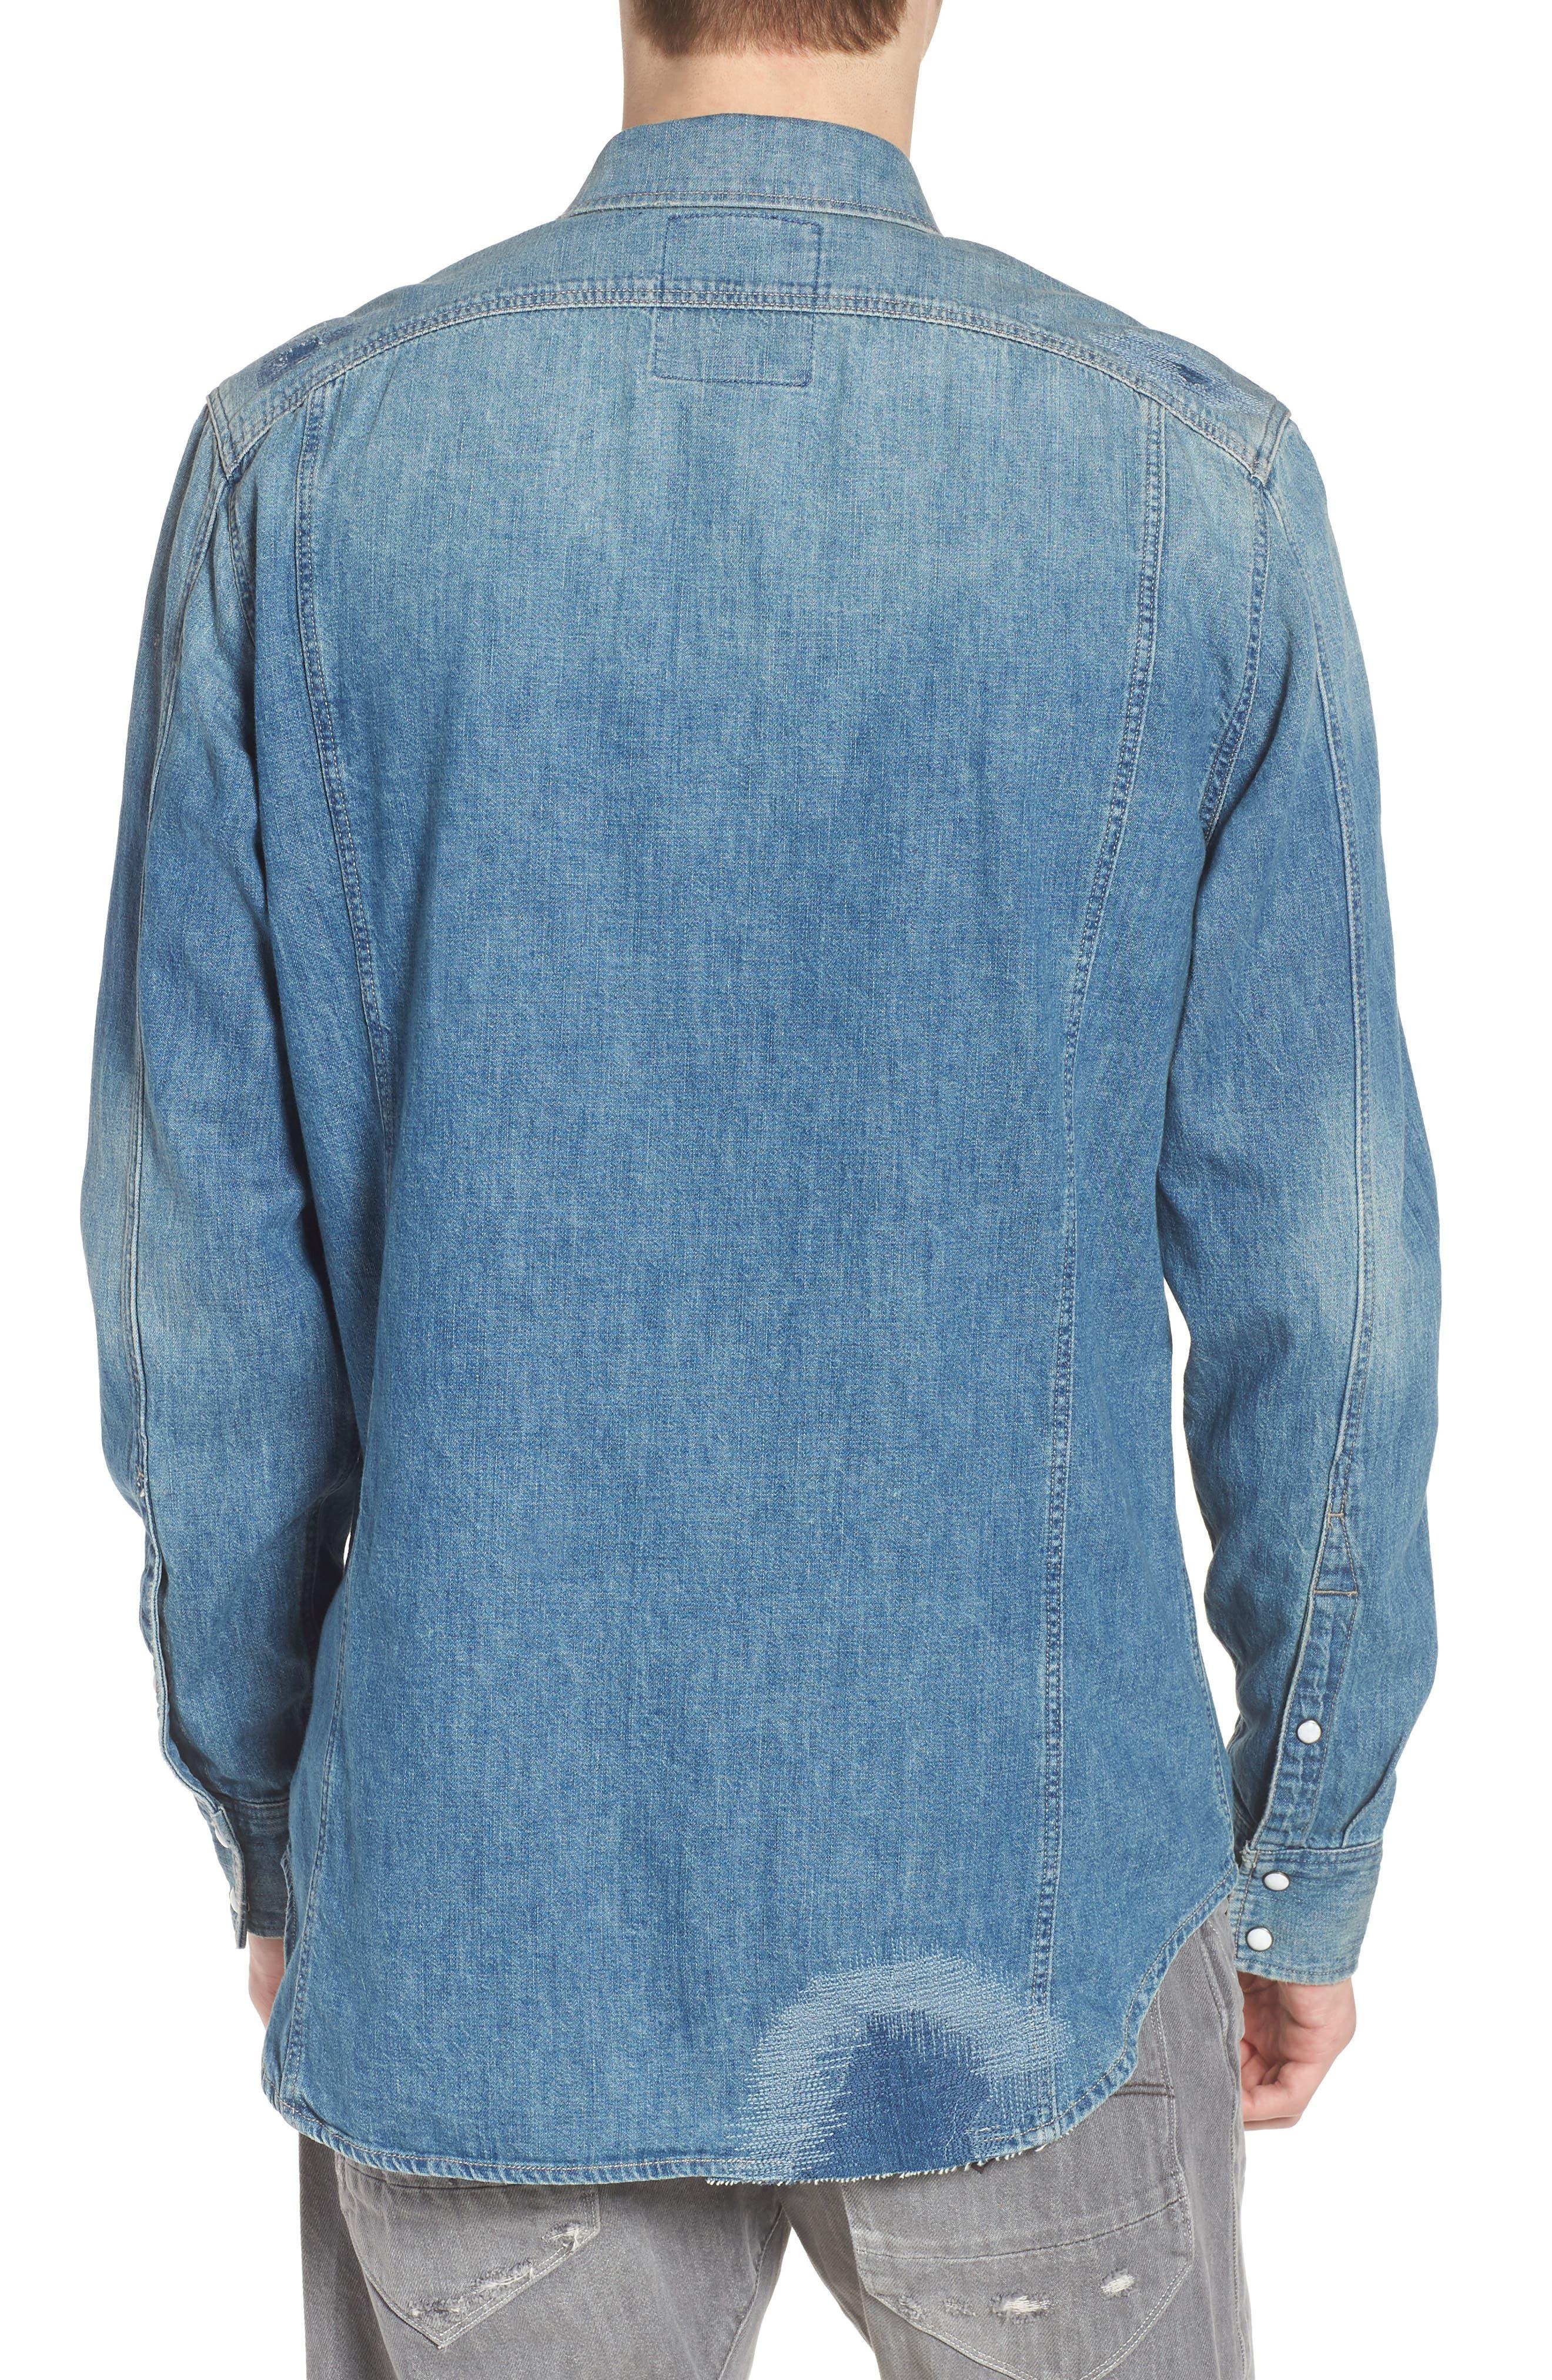 3301 Graft Denim Shirt,                             Alternate thumbnail 2, color,                             421